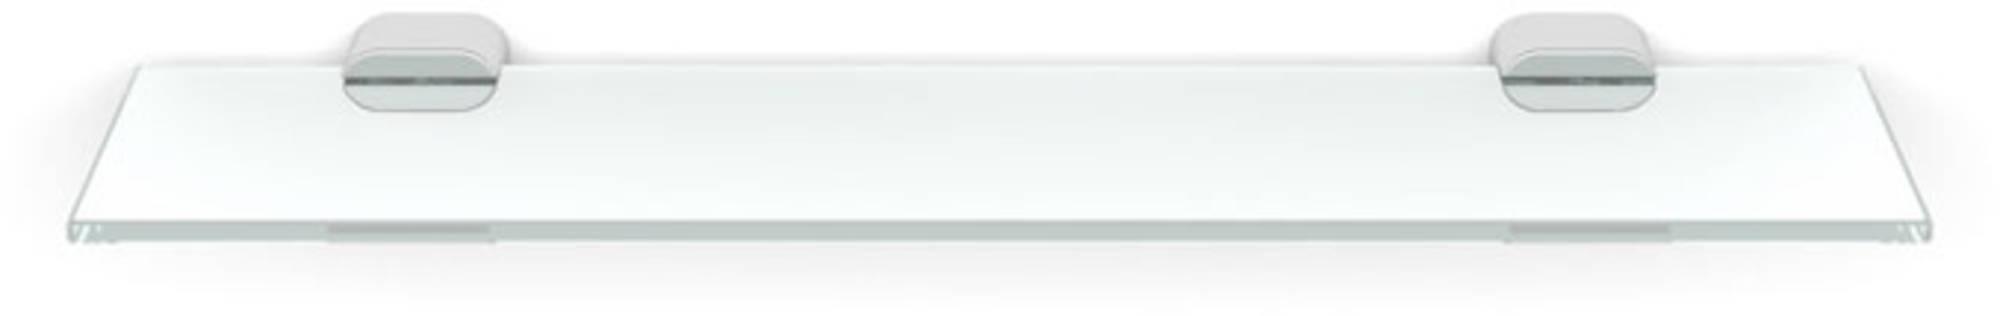 Ben Metropool Planchet 45x12 cm Kristalglas/Chroom